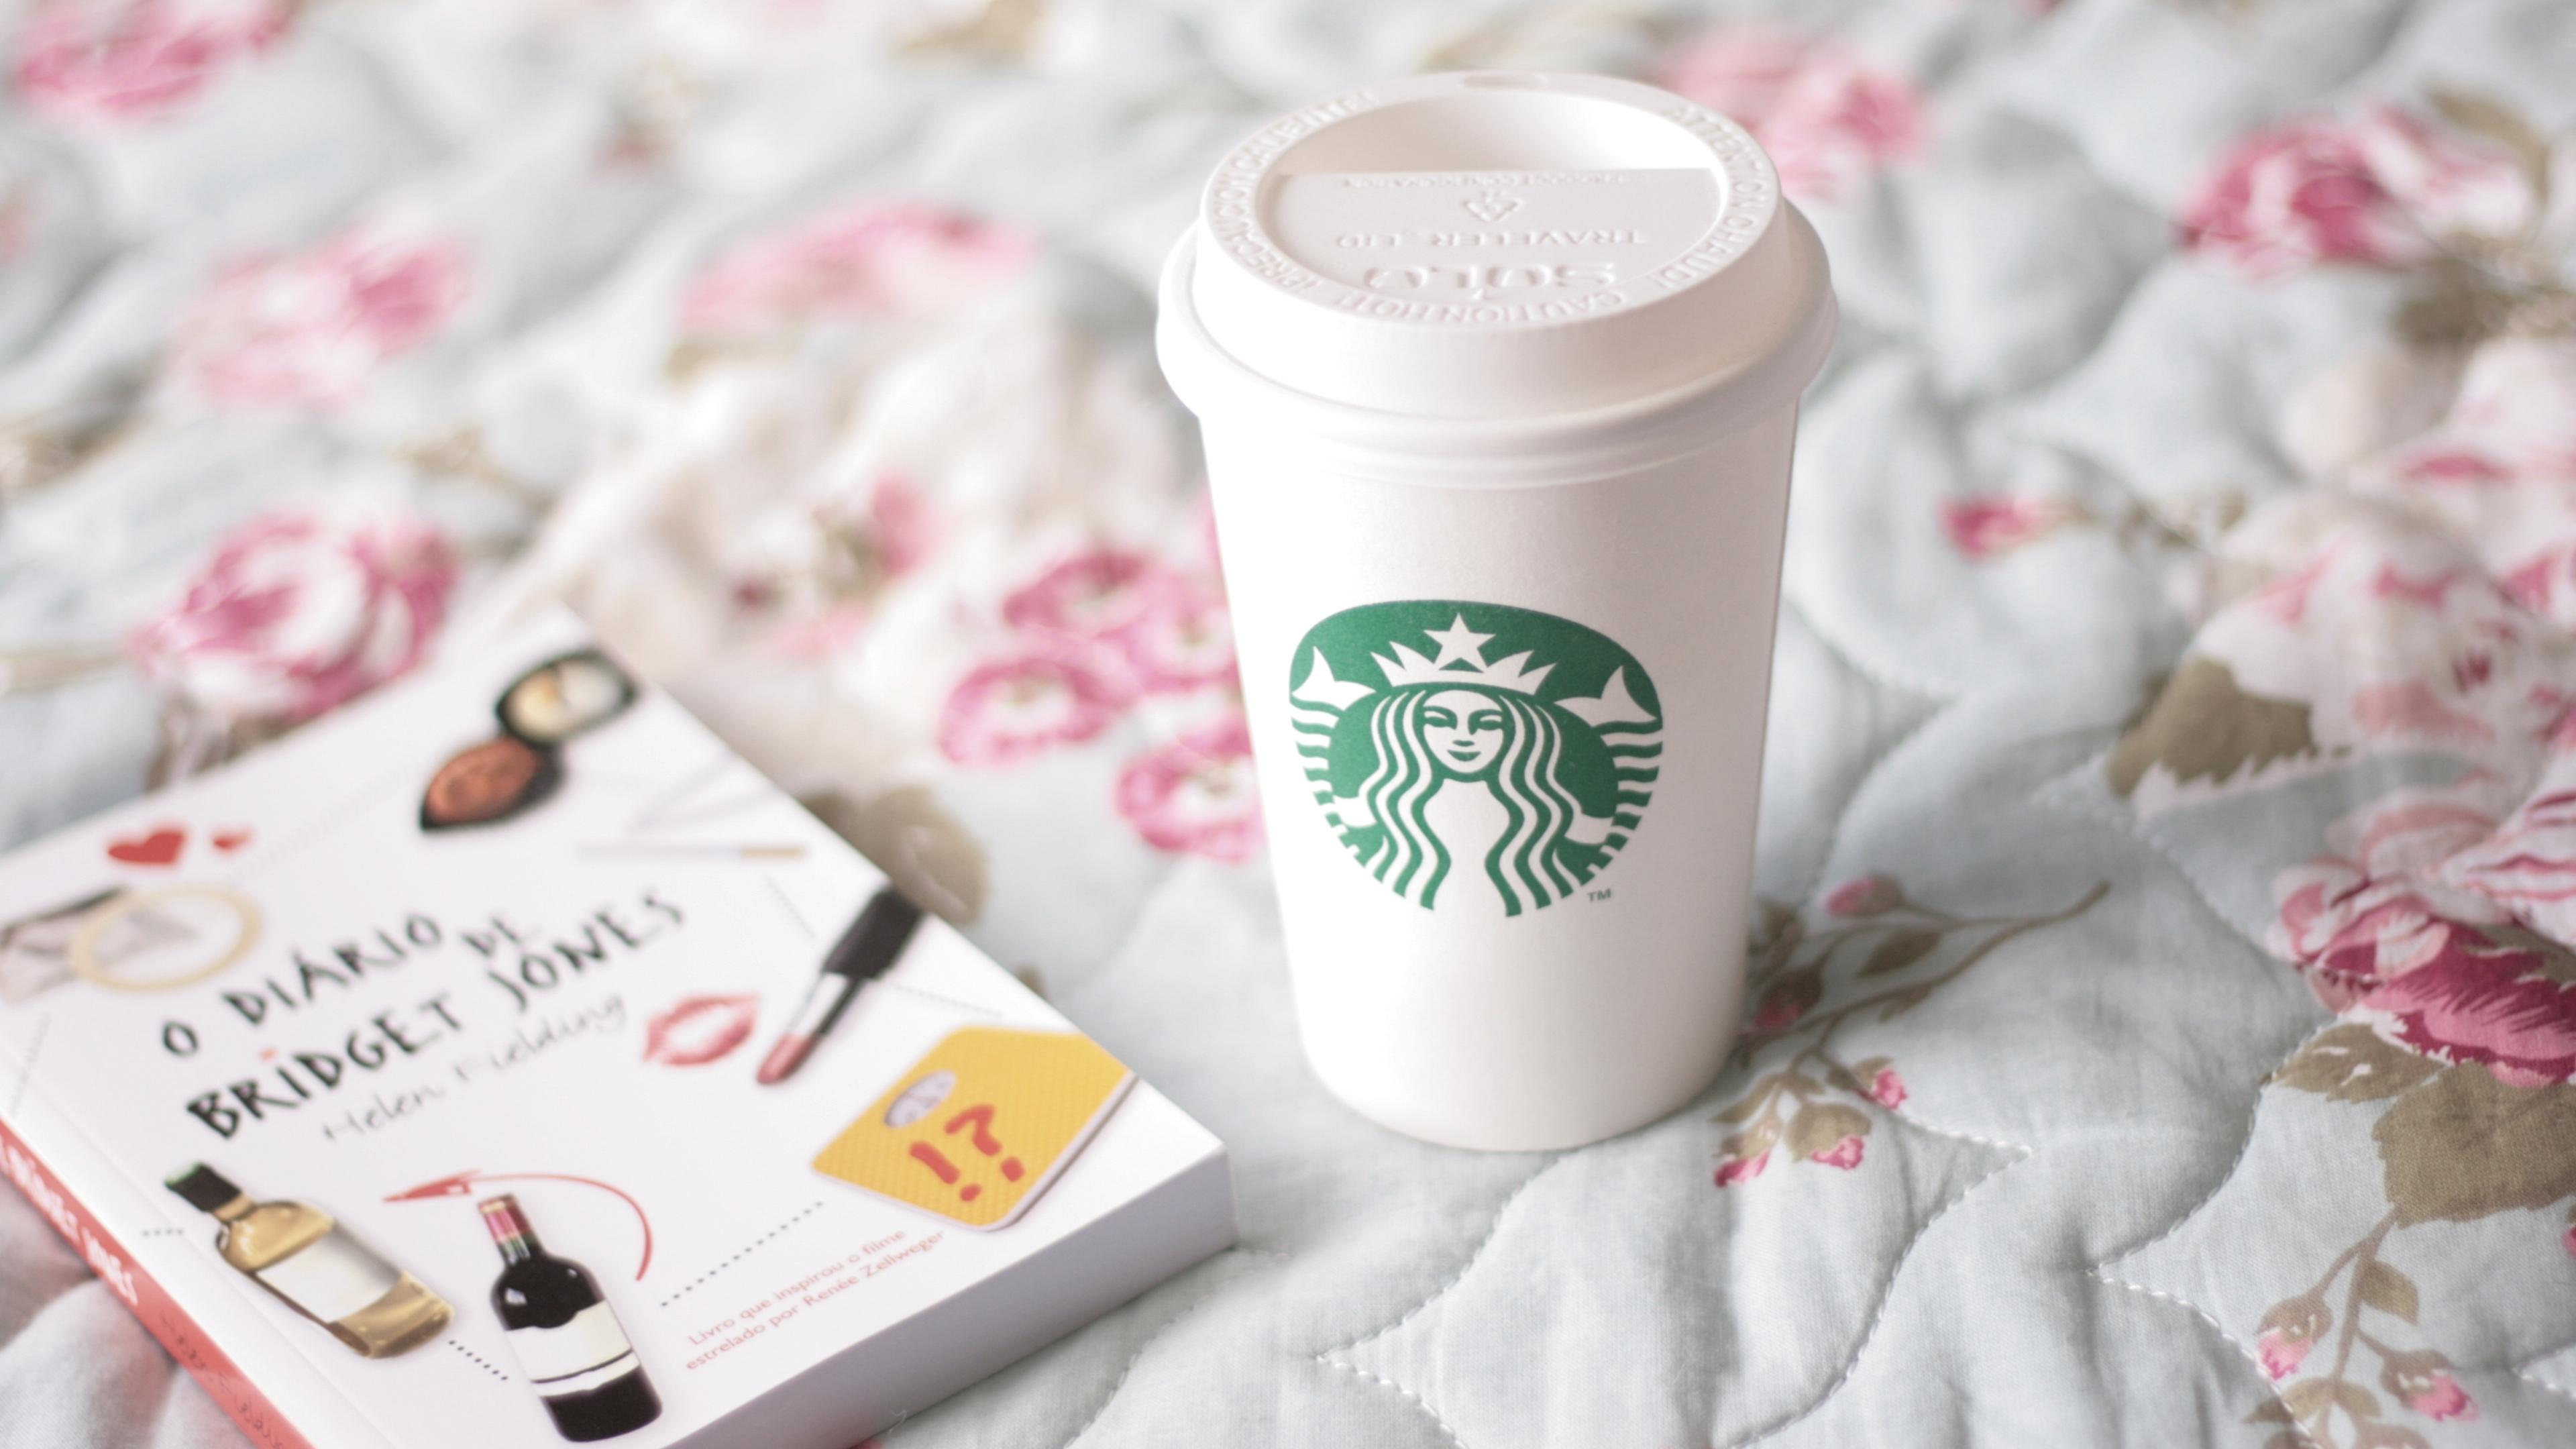 3840x2160 Starbucks Coffee Cup 4k Wallpaper Hd Brands 4k